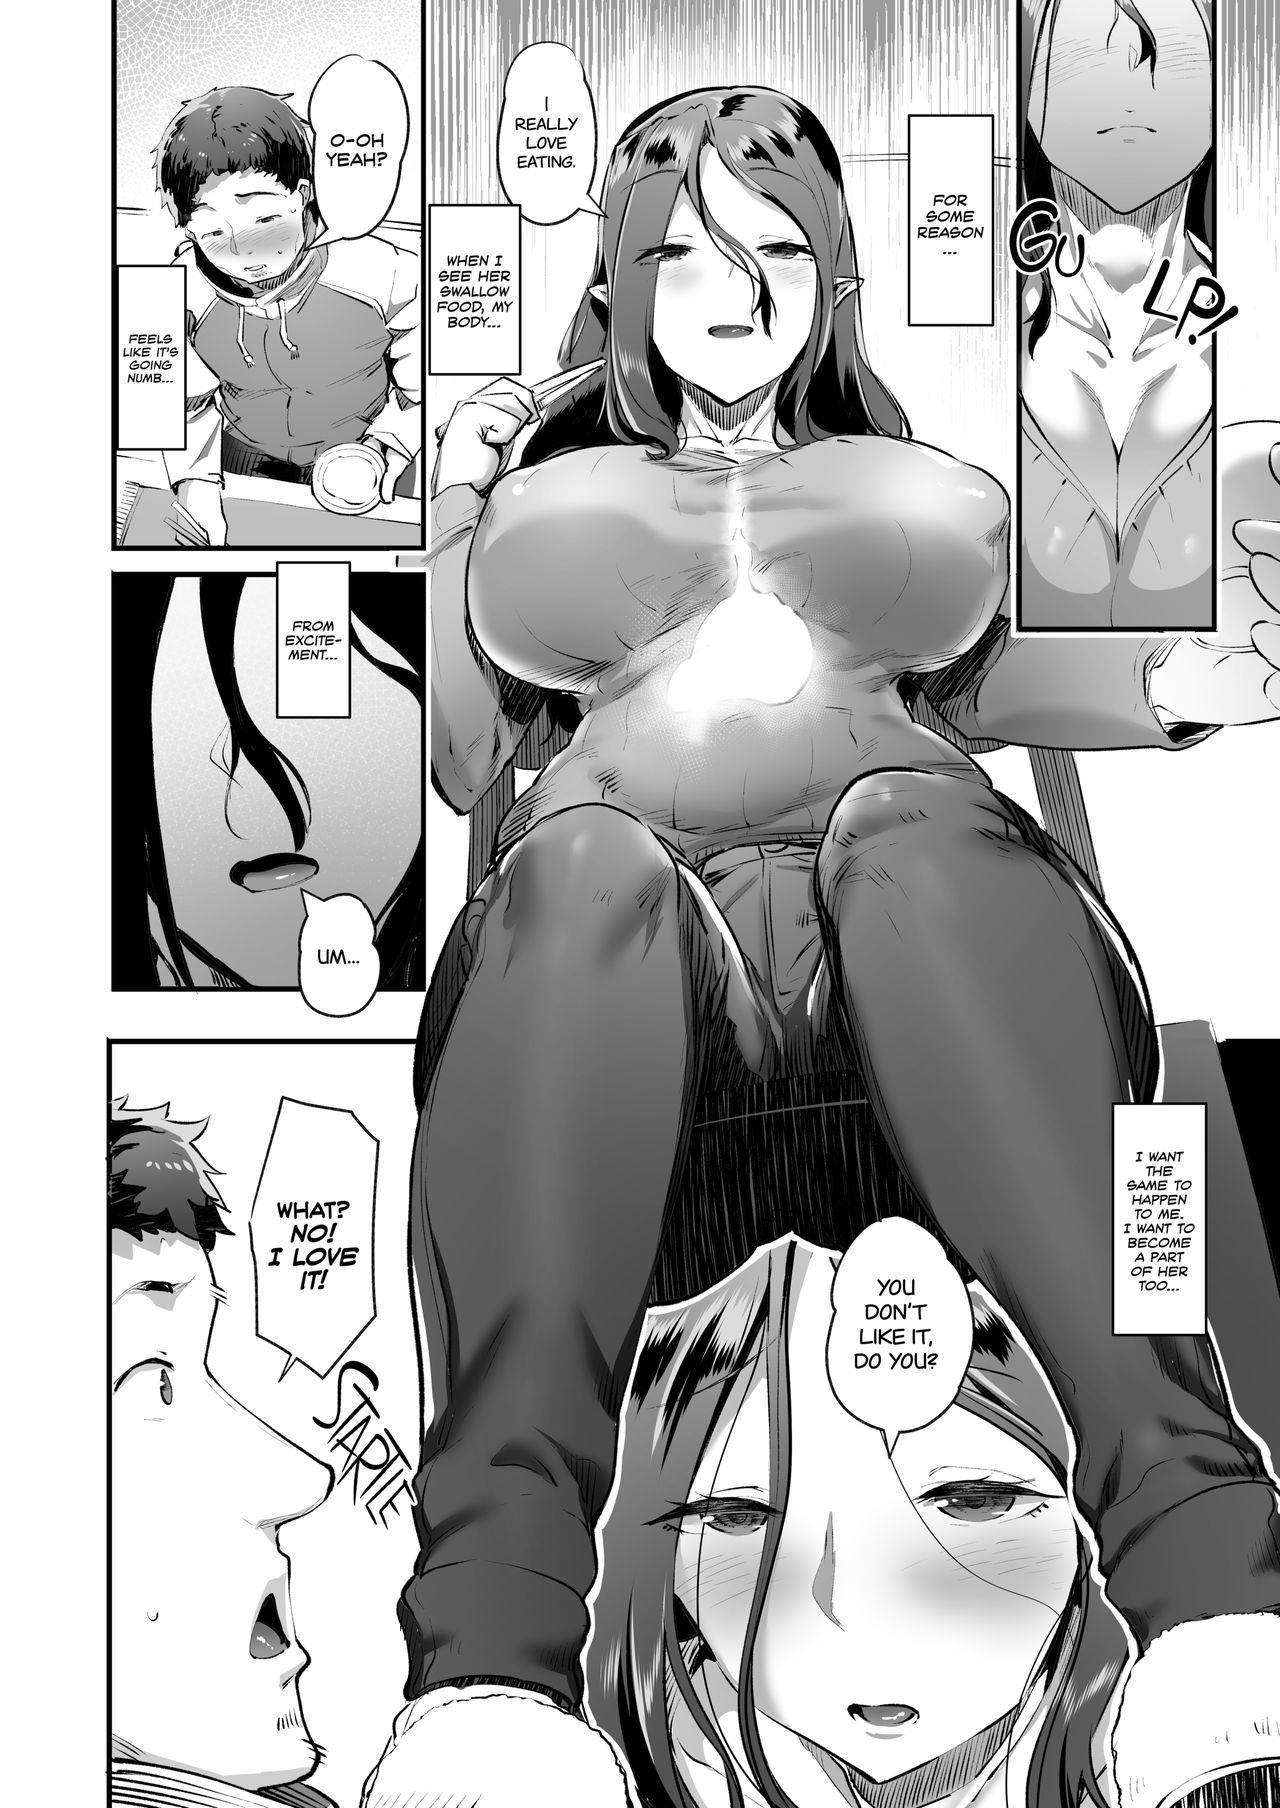 Succubus Miboujin Hirusagari no Himitsu | Succubus Widow's Afternoon Secret 6